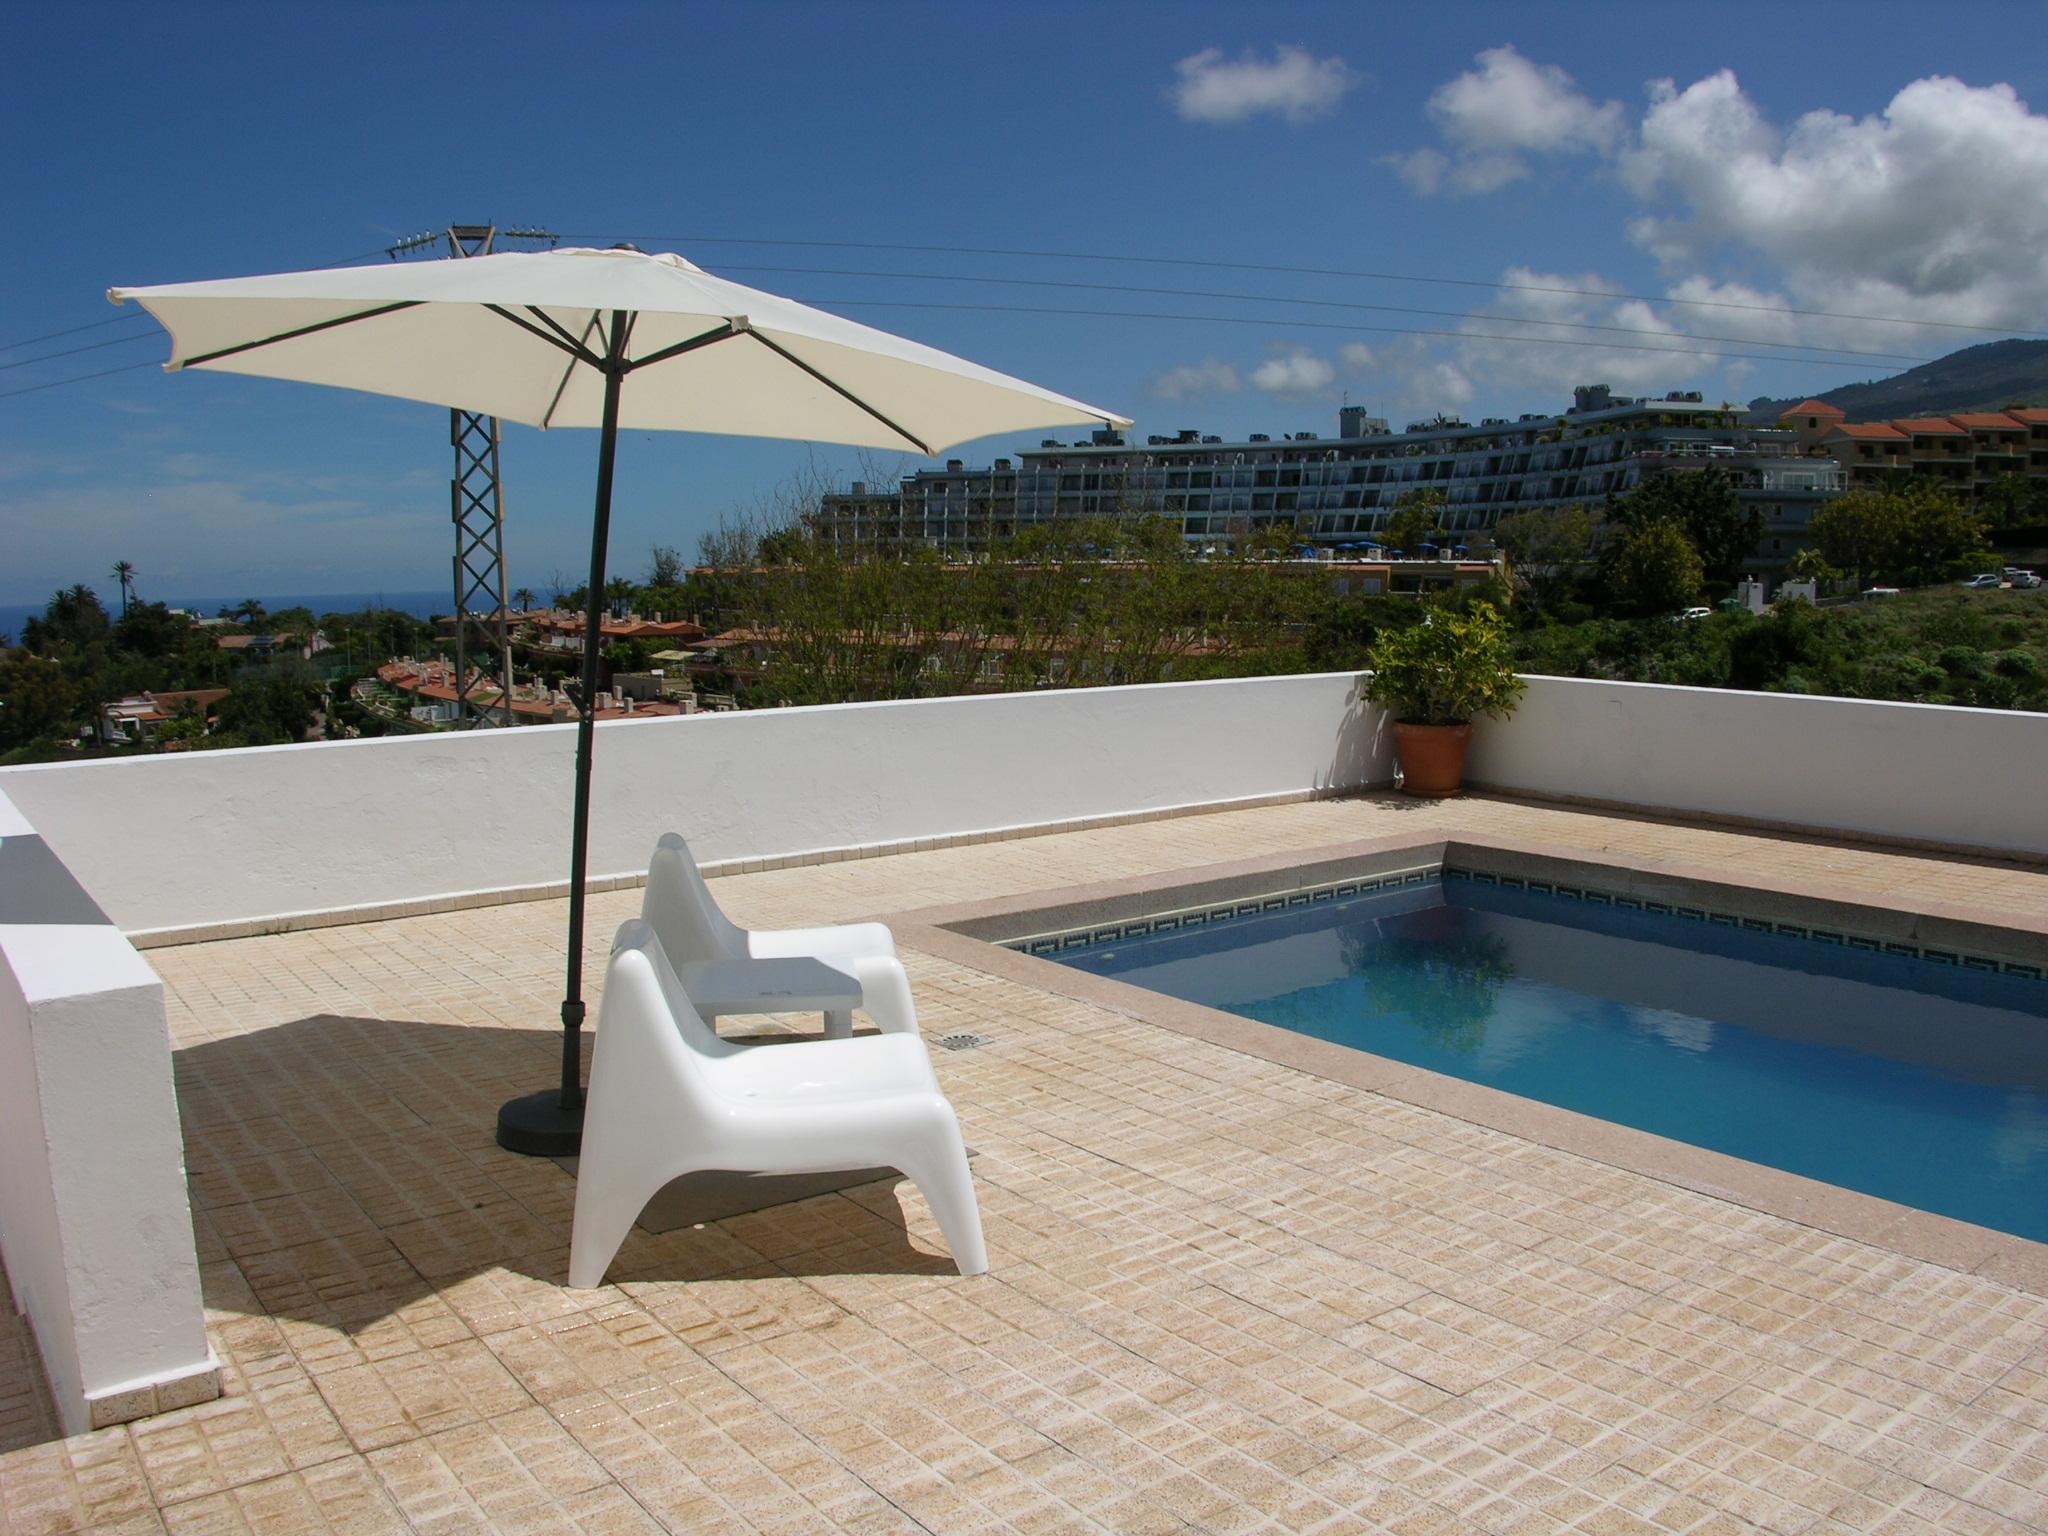 Maison de vacances Villa Vista La Quinta beheizbarer Pool kostenloses WLAN Grill (2124407), Santa Ursula, Ténérife, Iles Canaries, Espagne, image 55